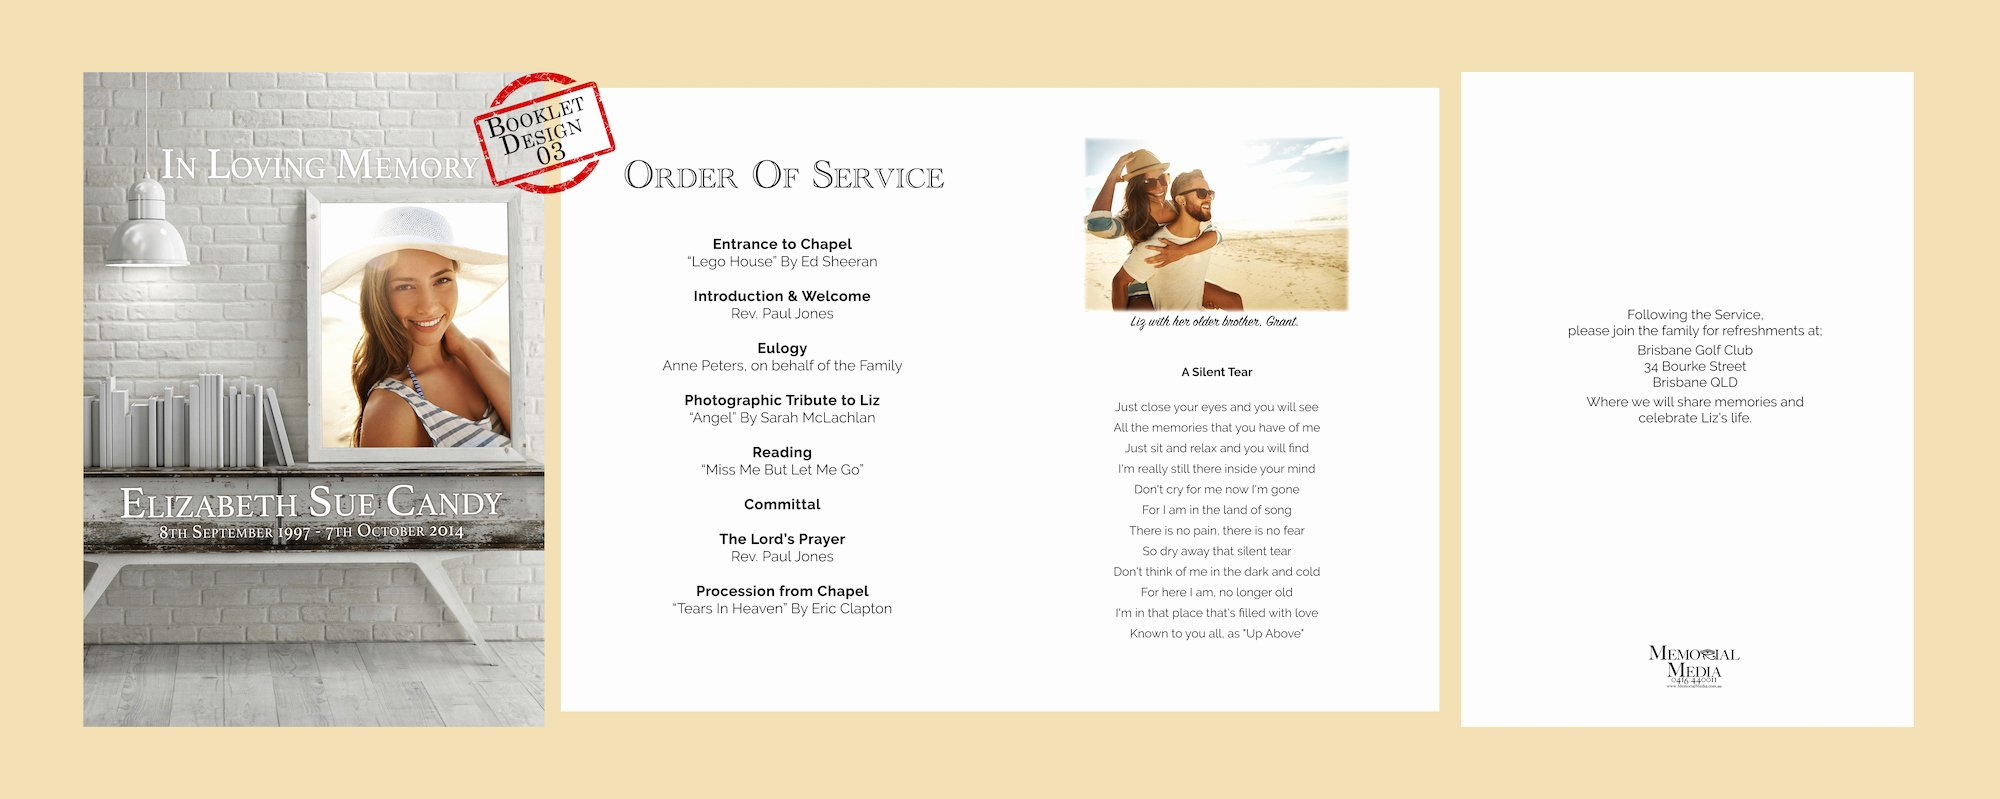 Funeral order Of Service Booklets Memorial Media Sydney